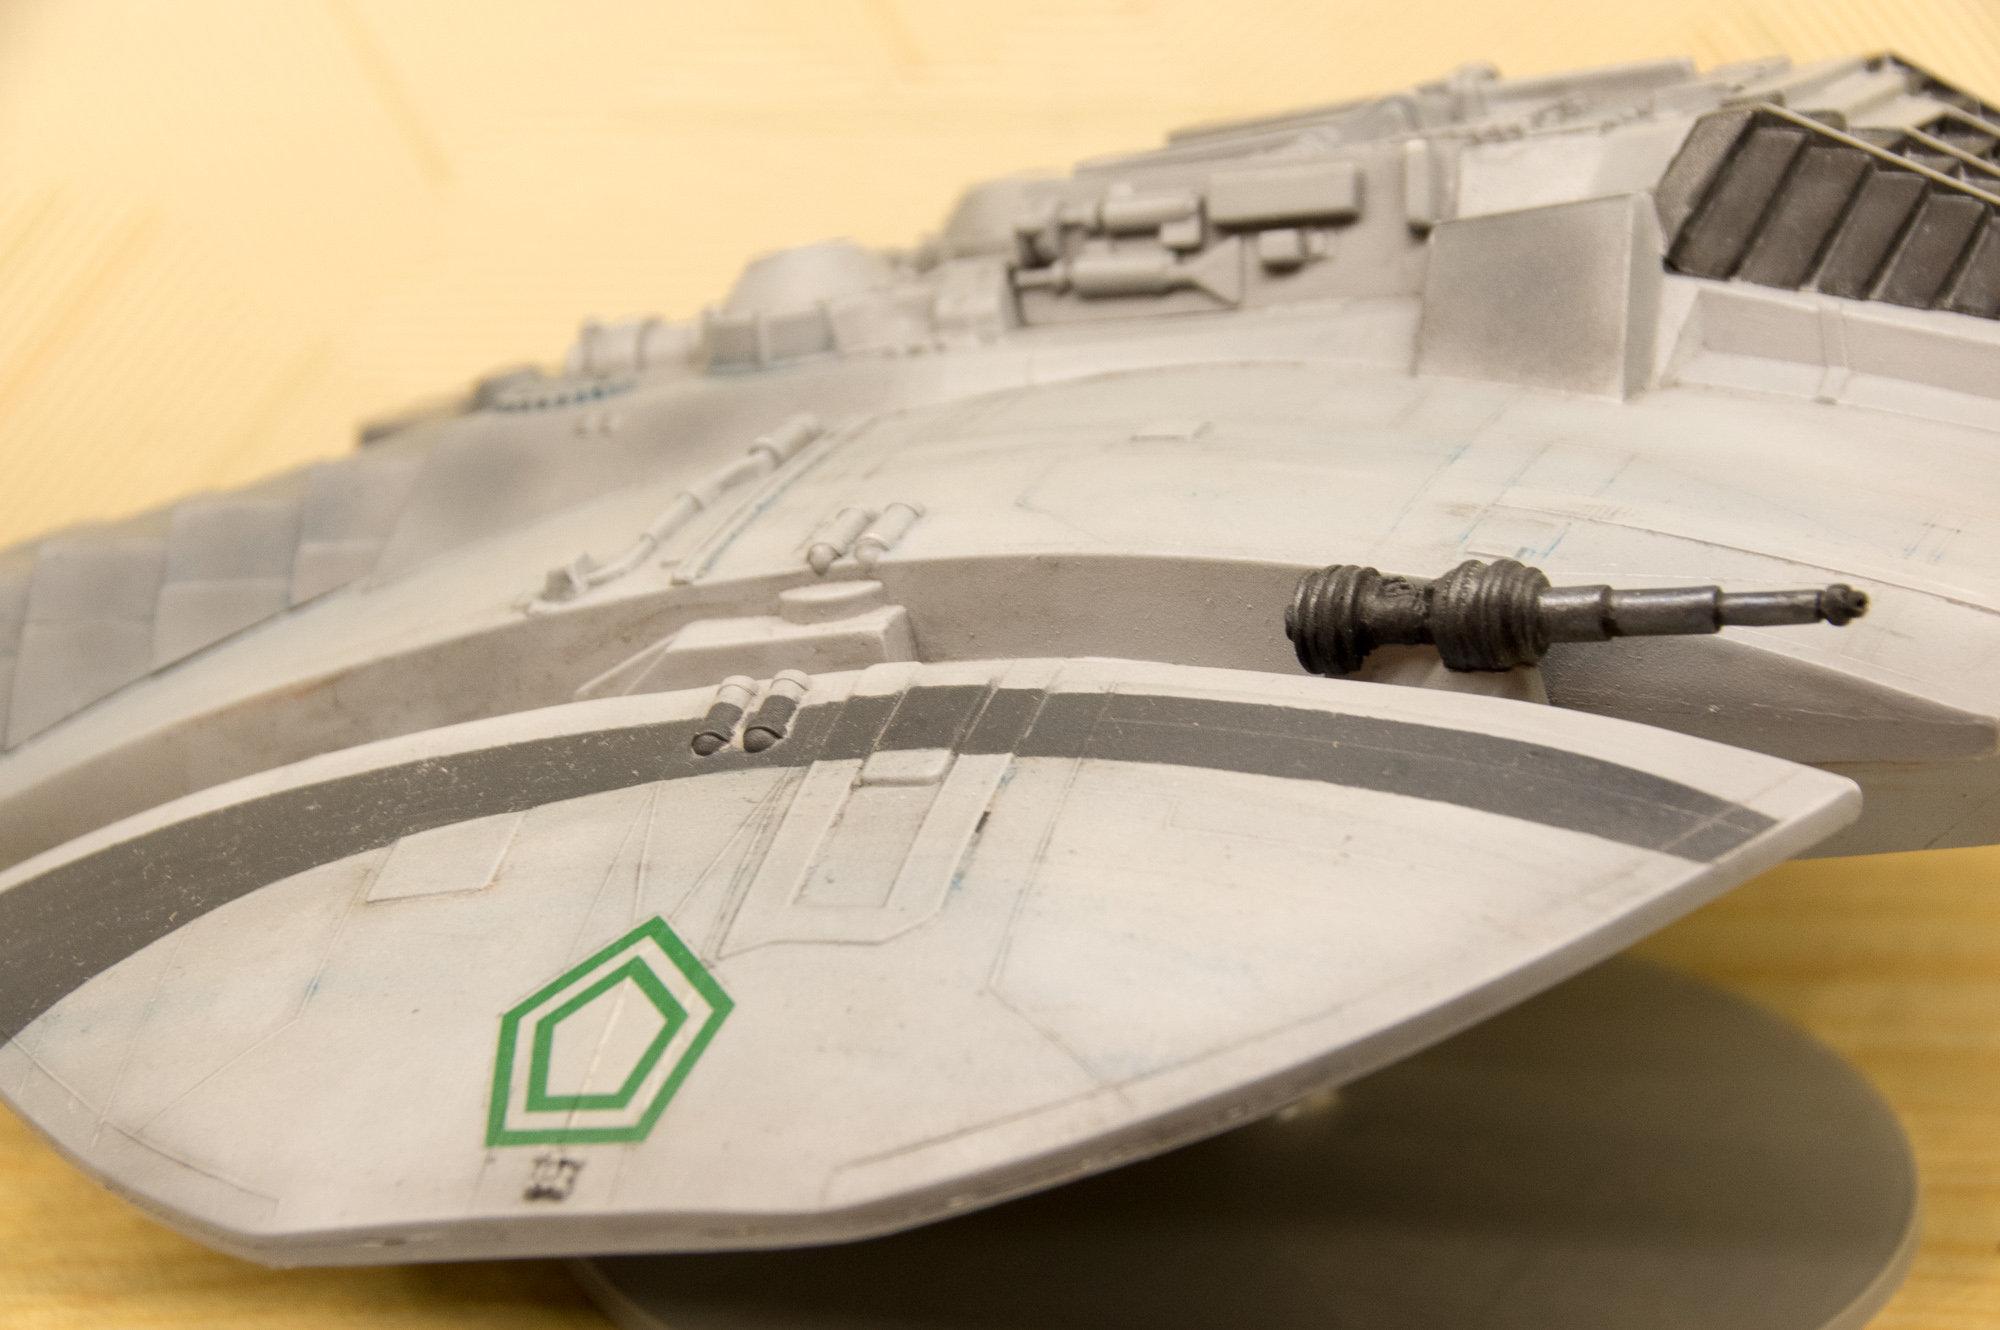 Chasseur Cylon - Galactica 1905190755575682